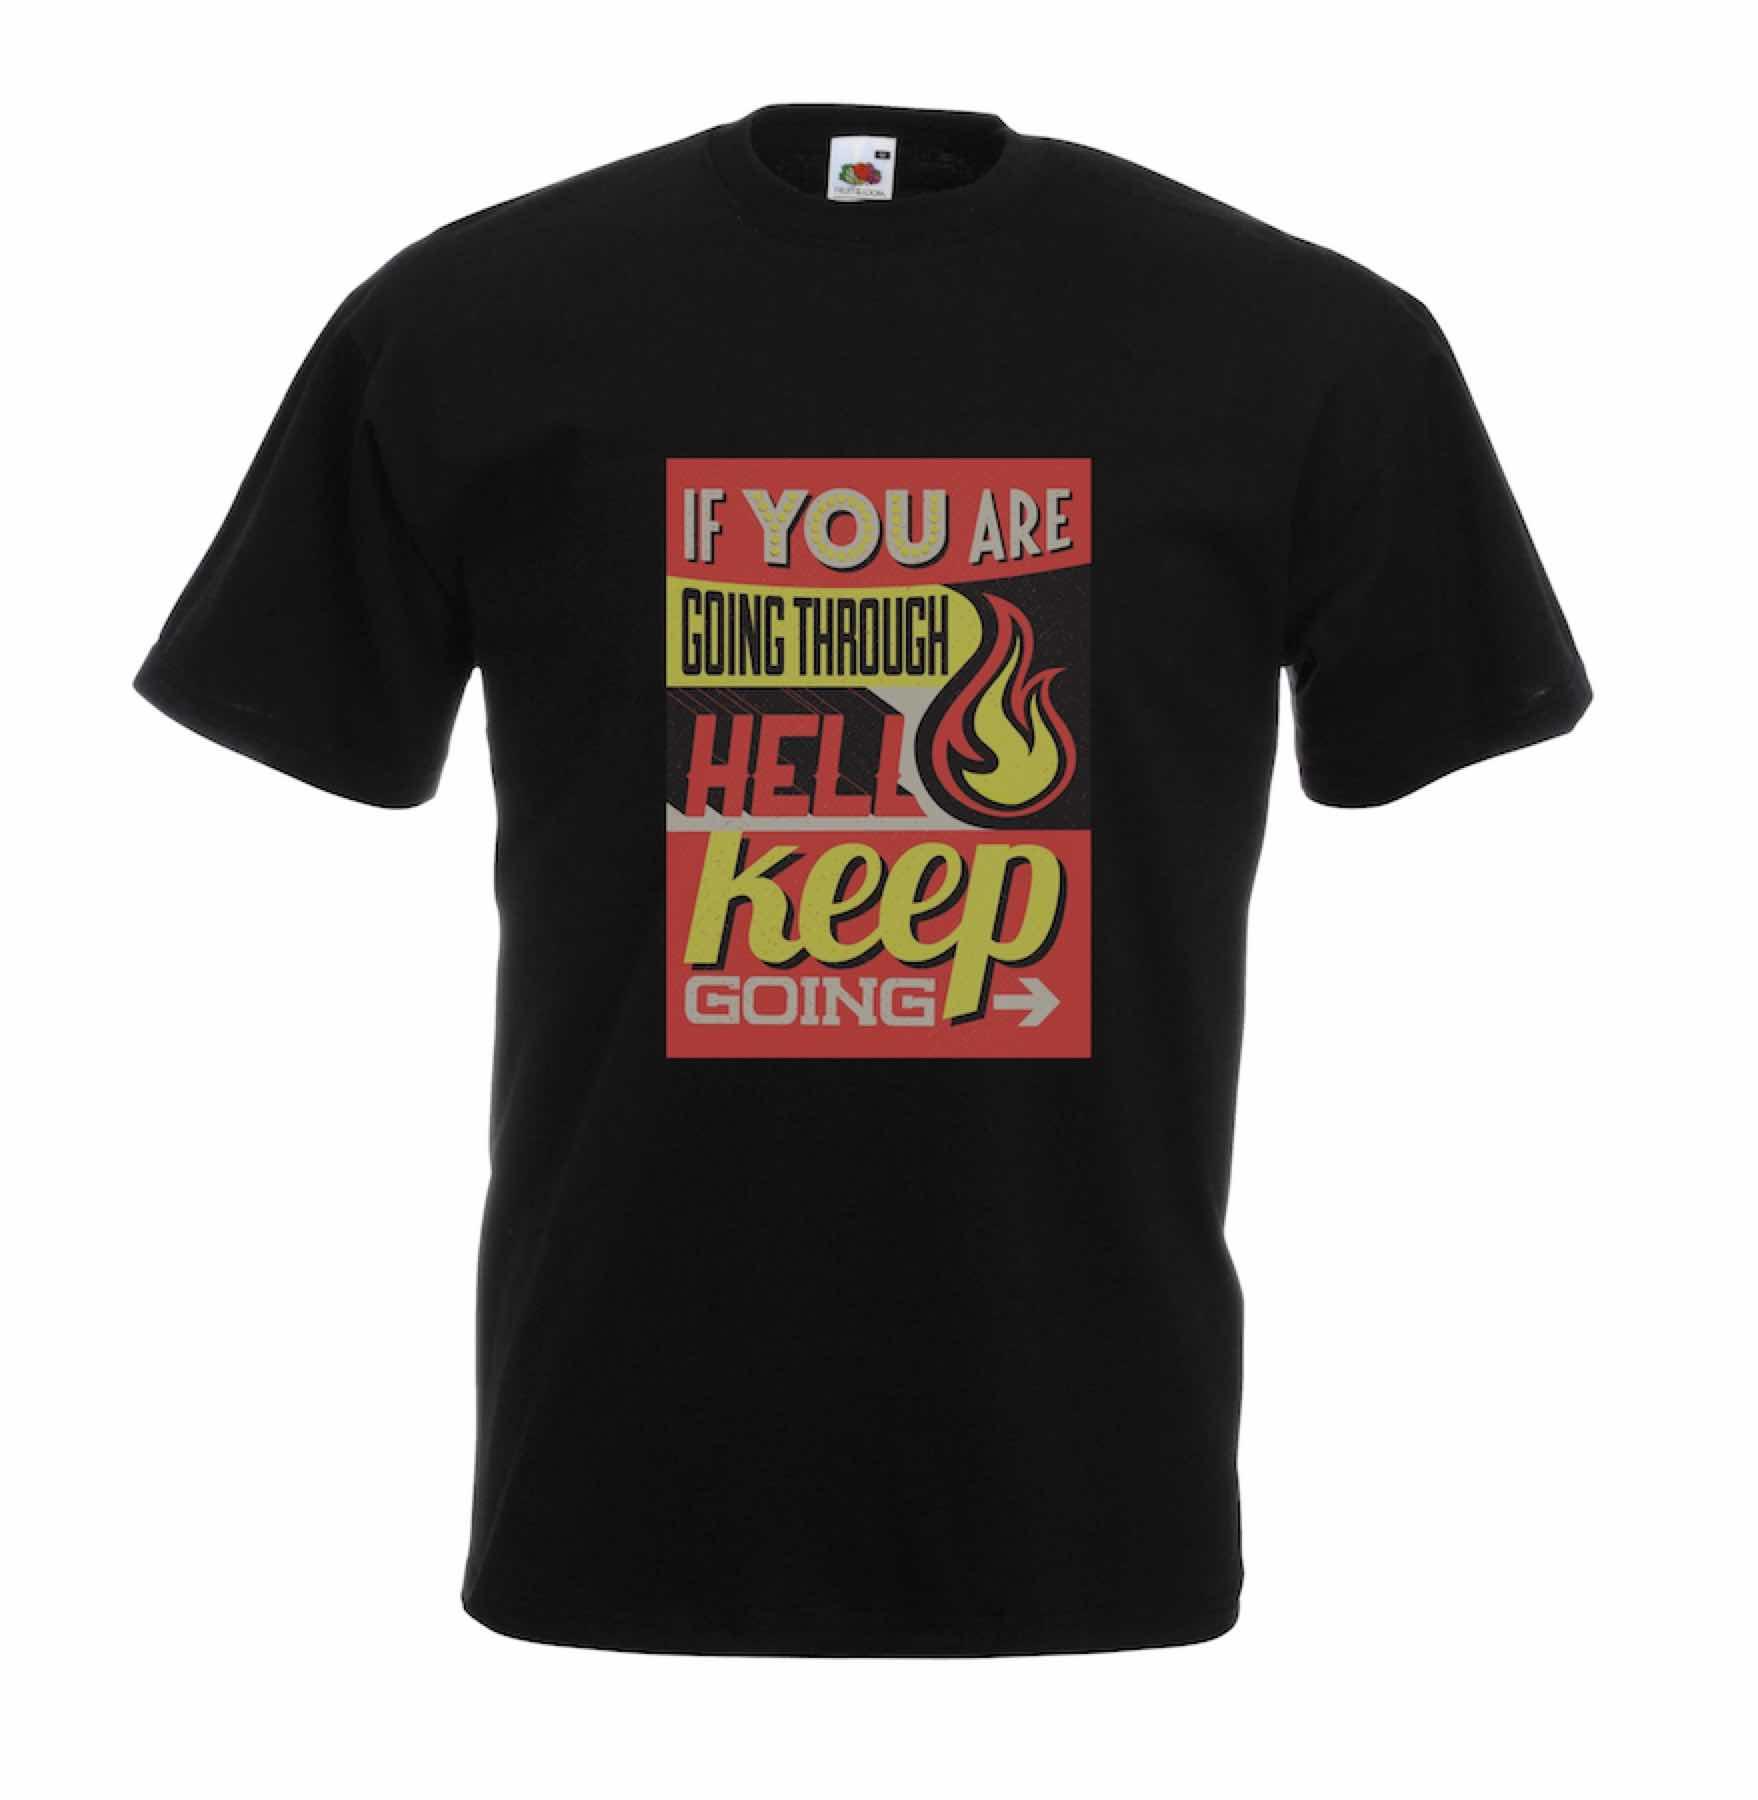 Hell design for t-shirt, hoodie & sweatshirt